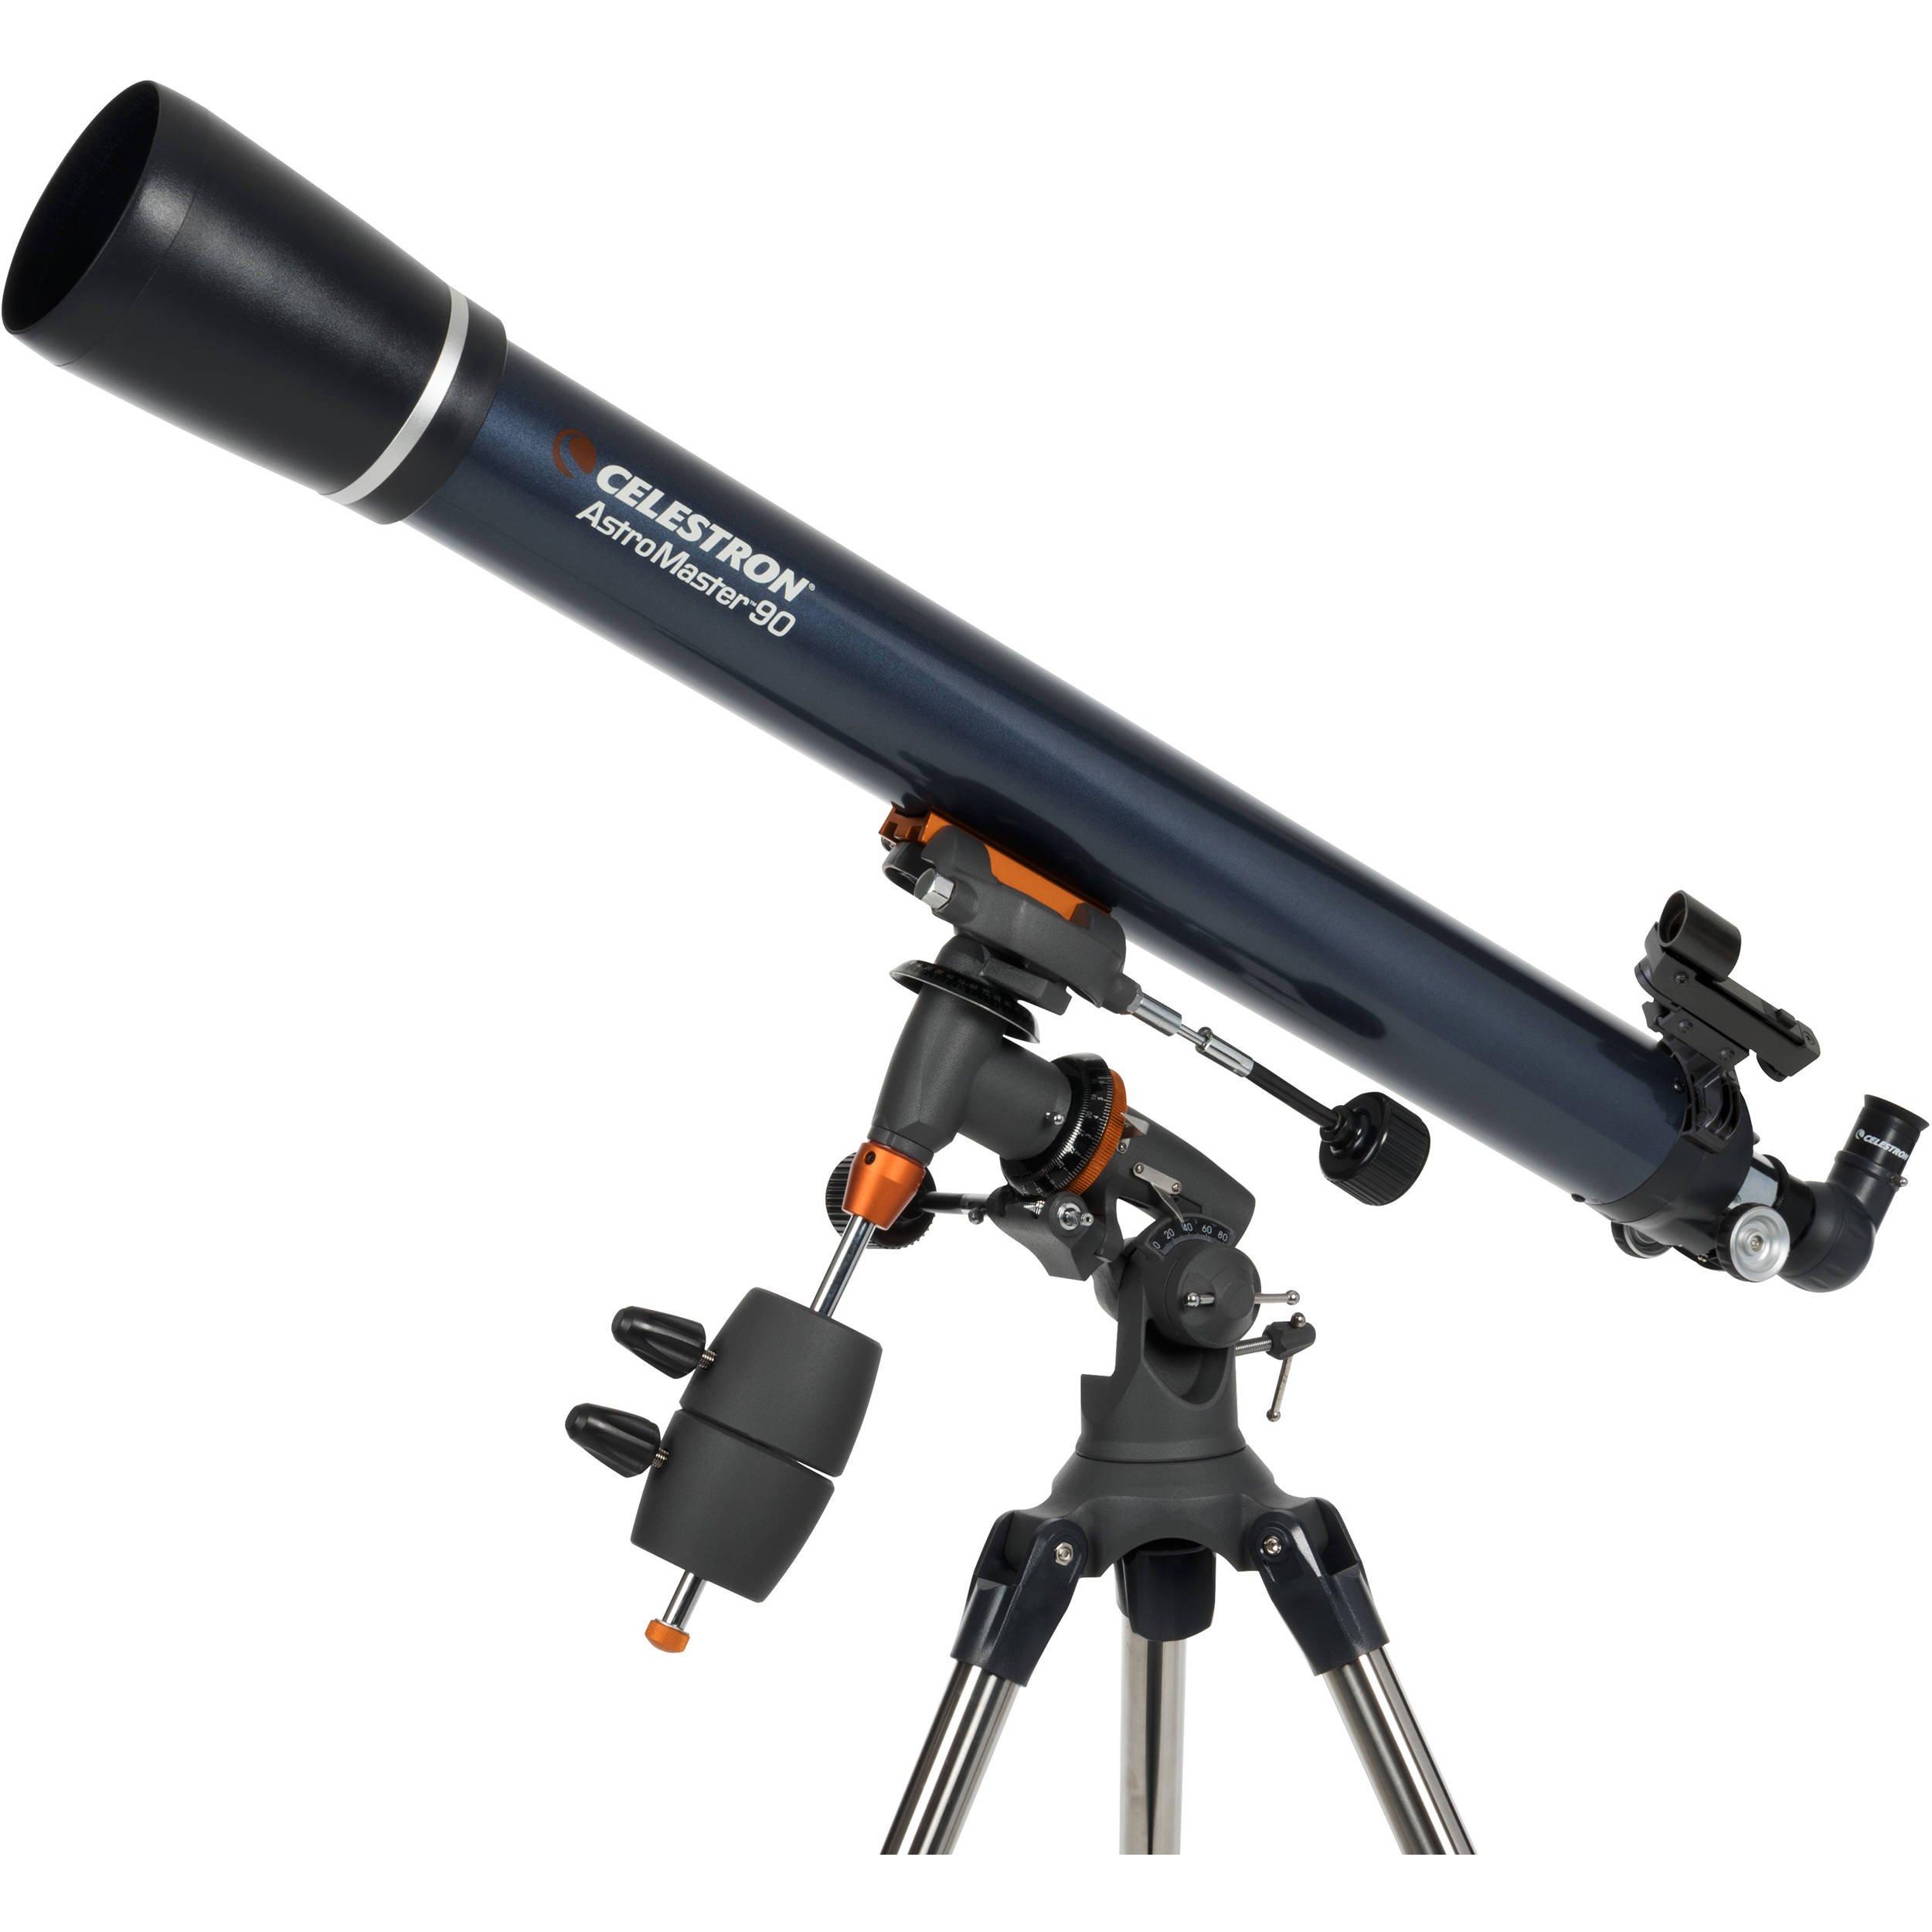 Celestron AstroMaster 90